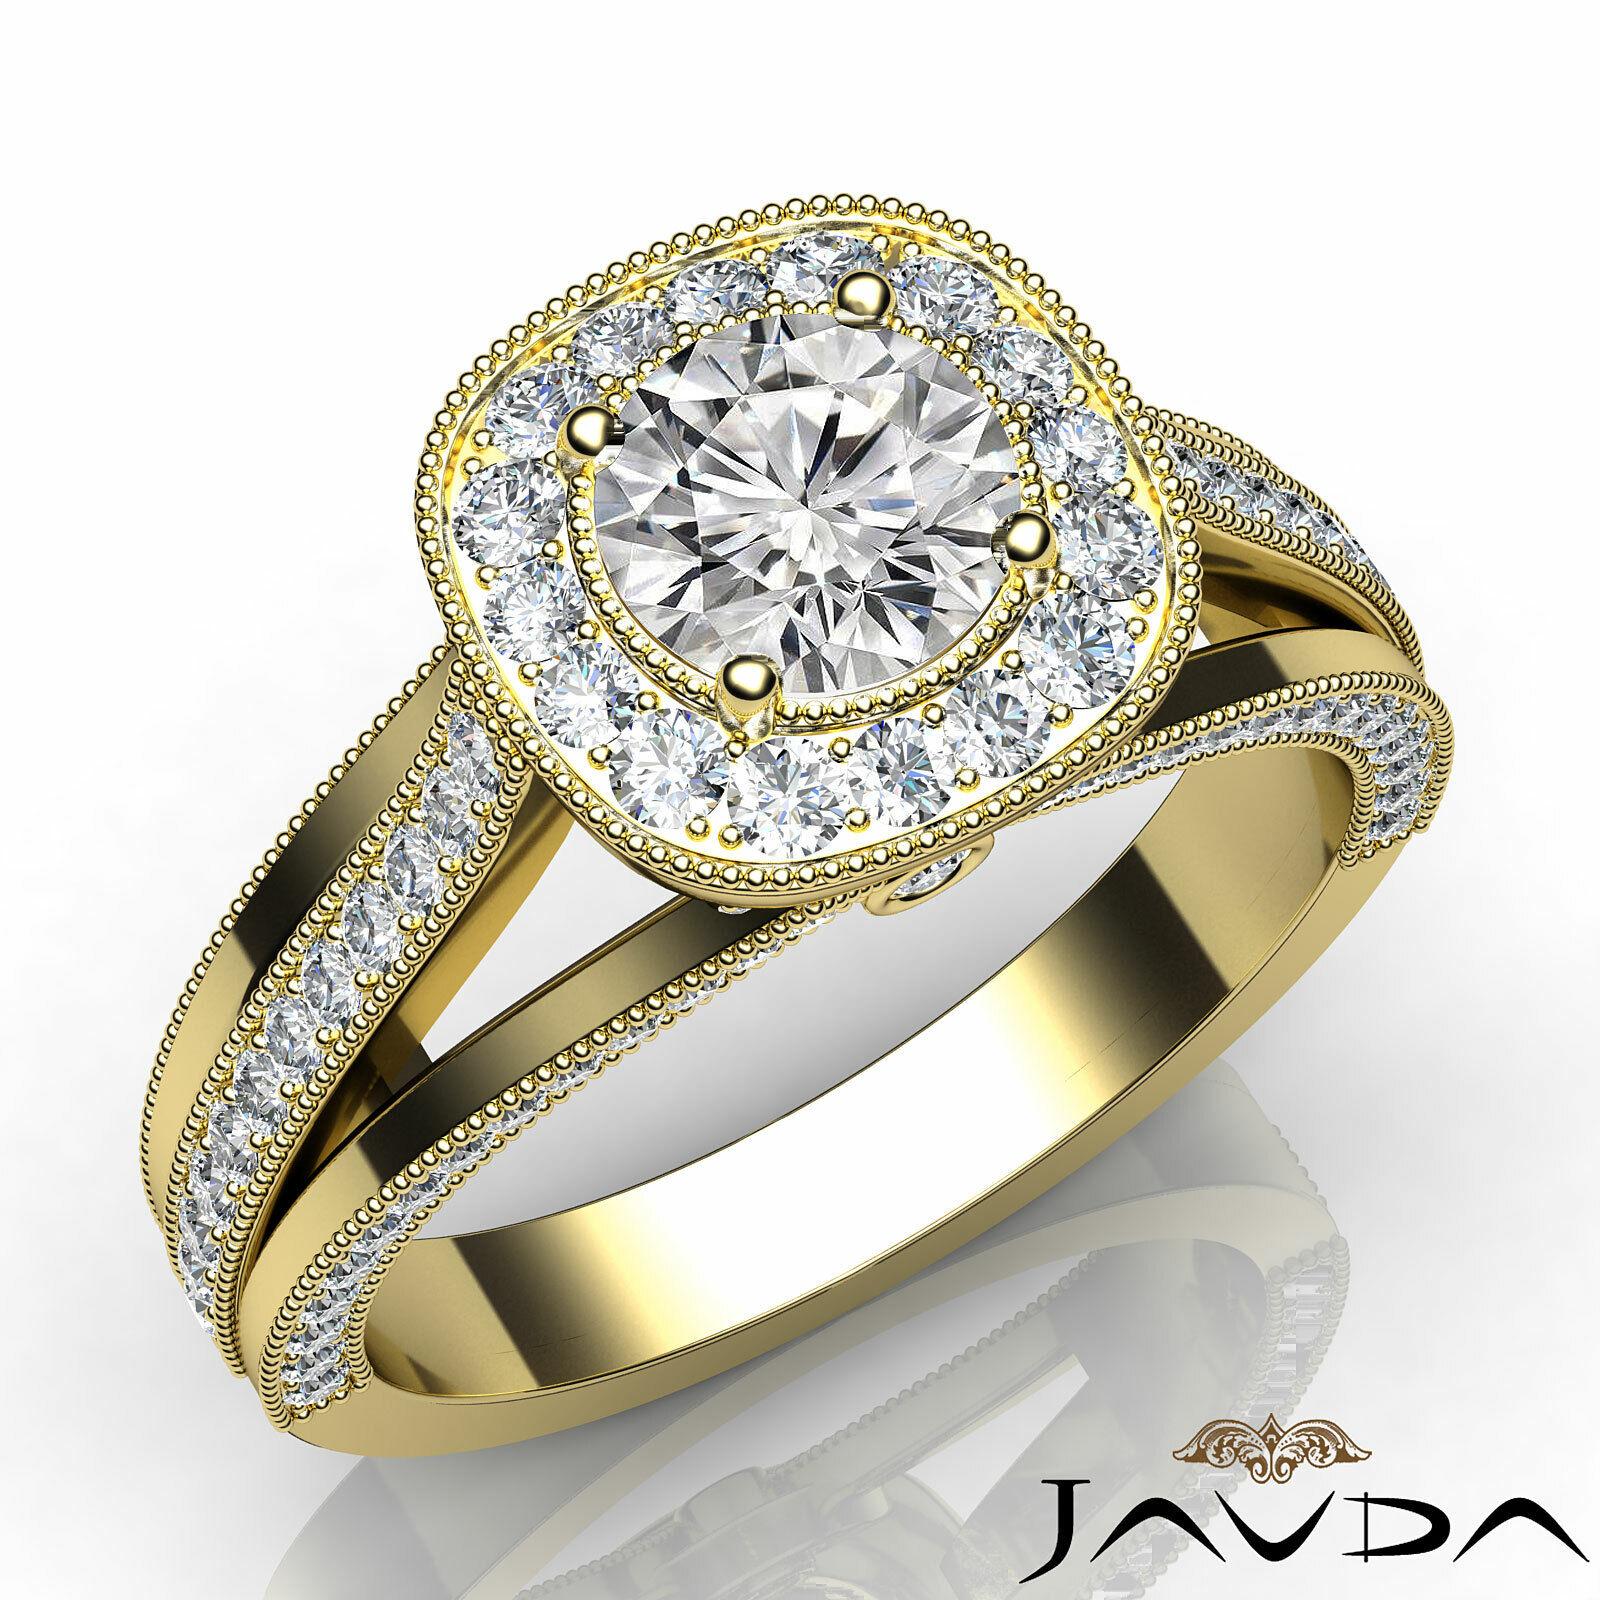 1.6ctw Bridge Accent Round Diamond Engagement Ring GIA E-VVS2 White Gold Rings 6